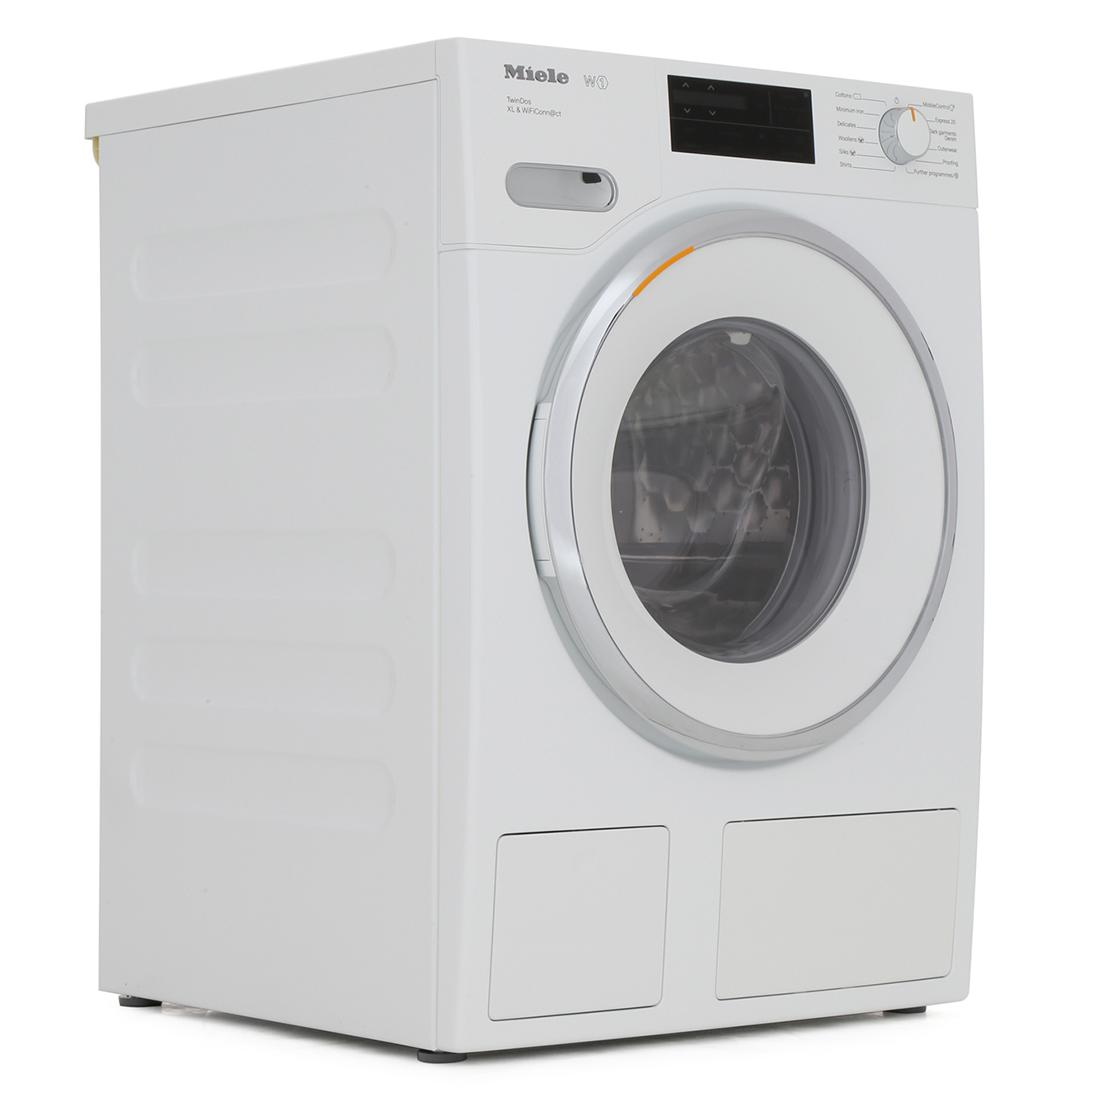 Buy Miele W1 - WhiteEdition WWI660 TwinDos XL White ...